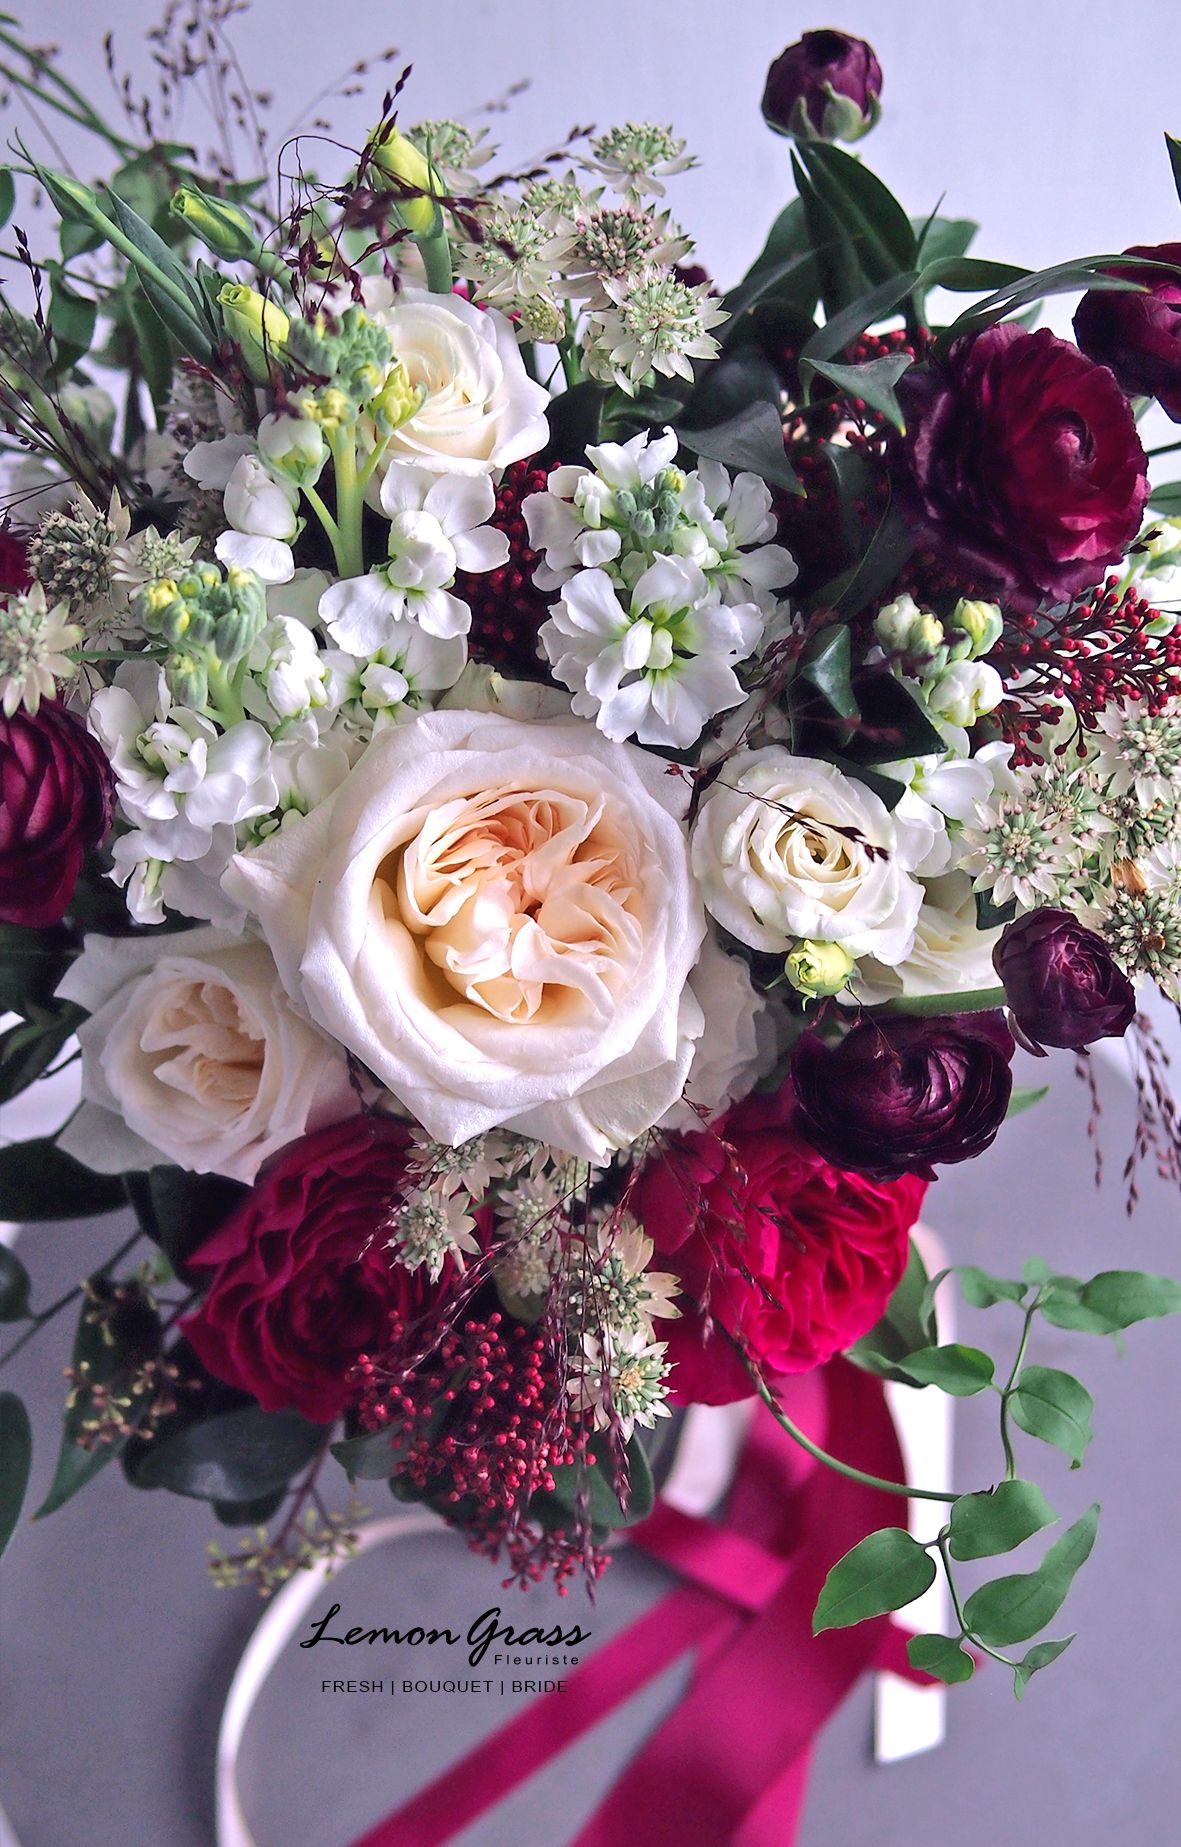 Pin by lemongrasswedding on fresh flower bouquets pinterest flower designs flower bouquets izmirmasajfo